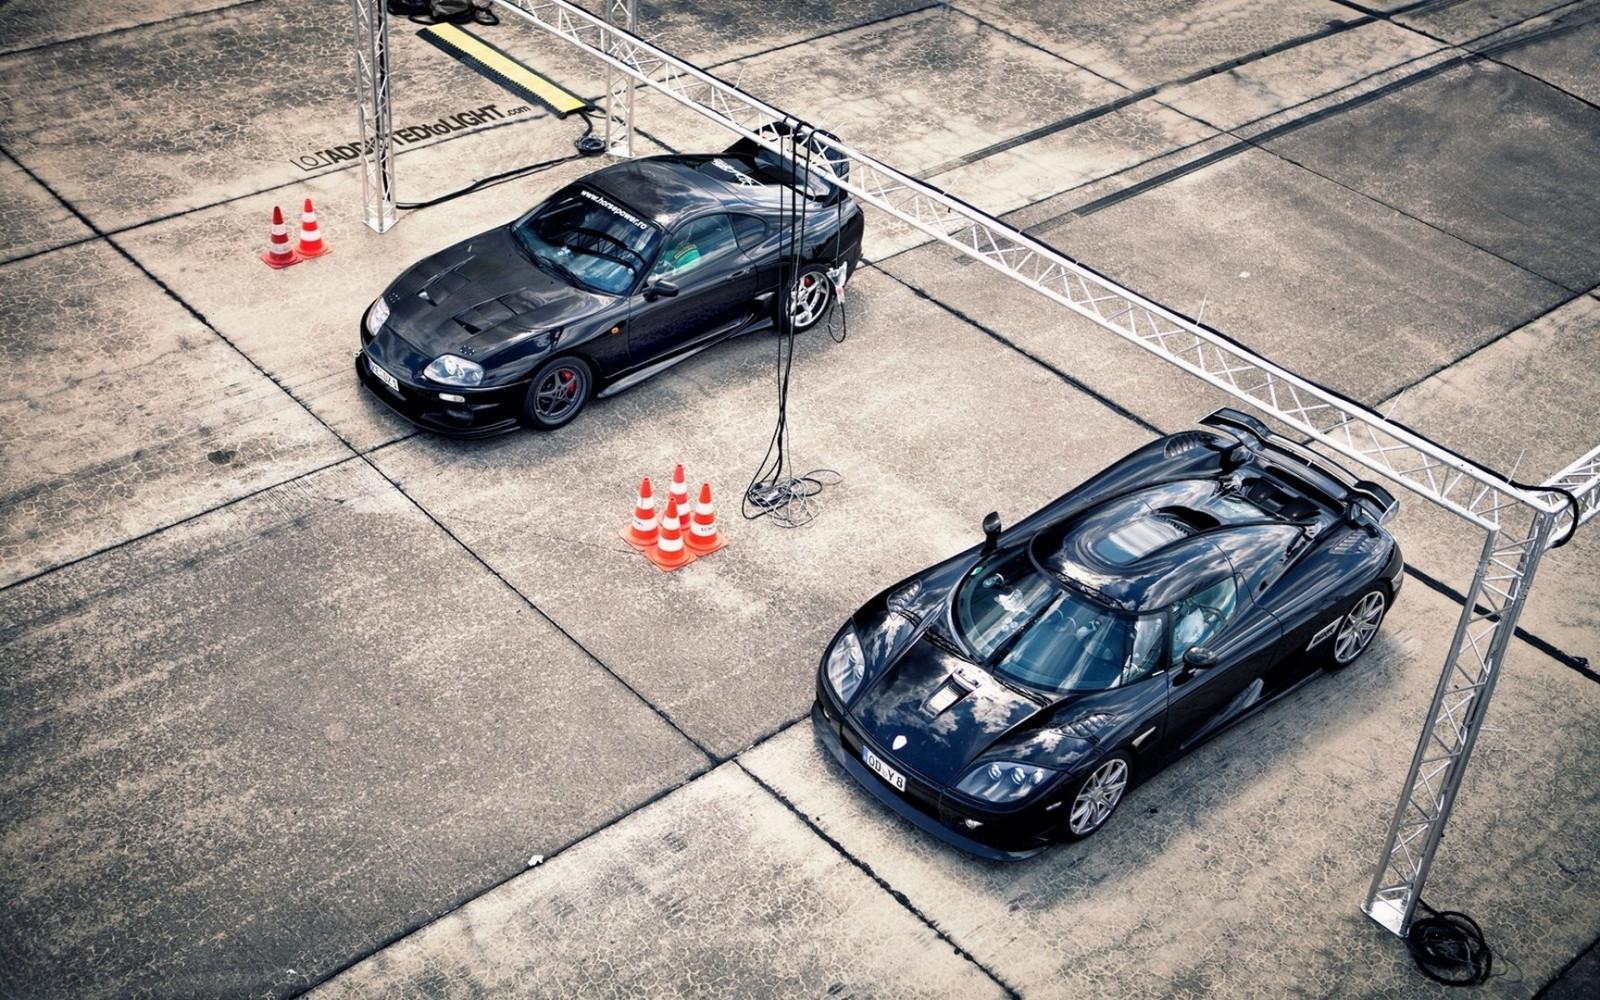 Wallpaper 1728x1080 Px Car Hypercar Koenigsegg Need